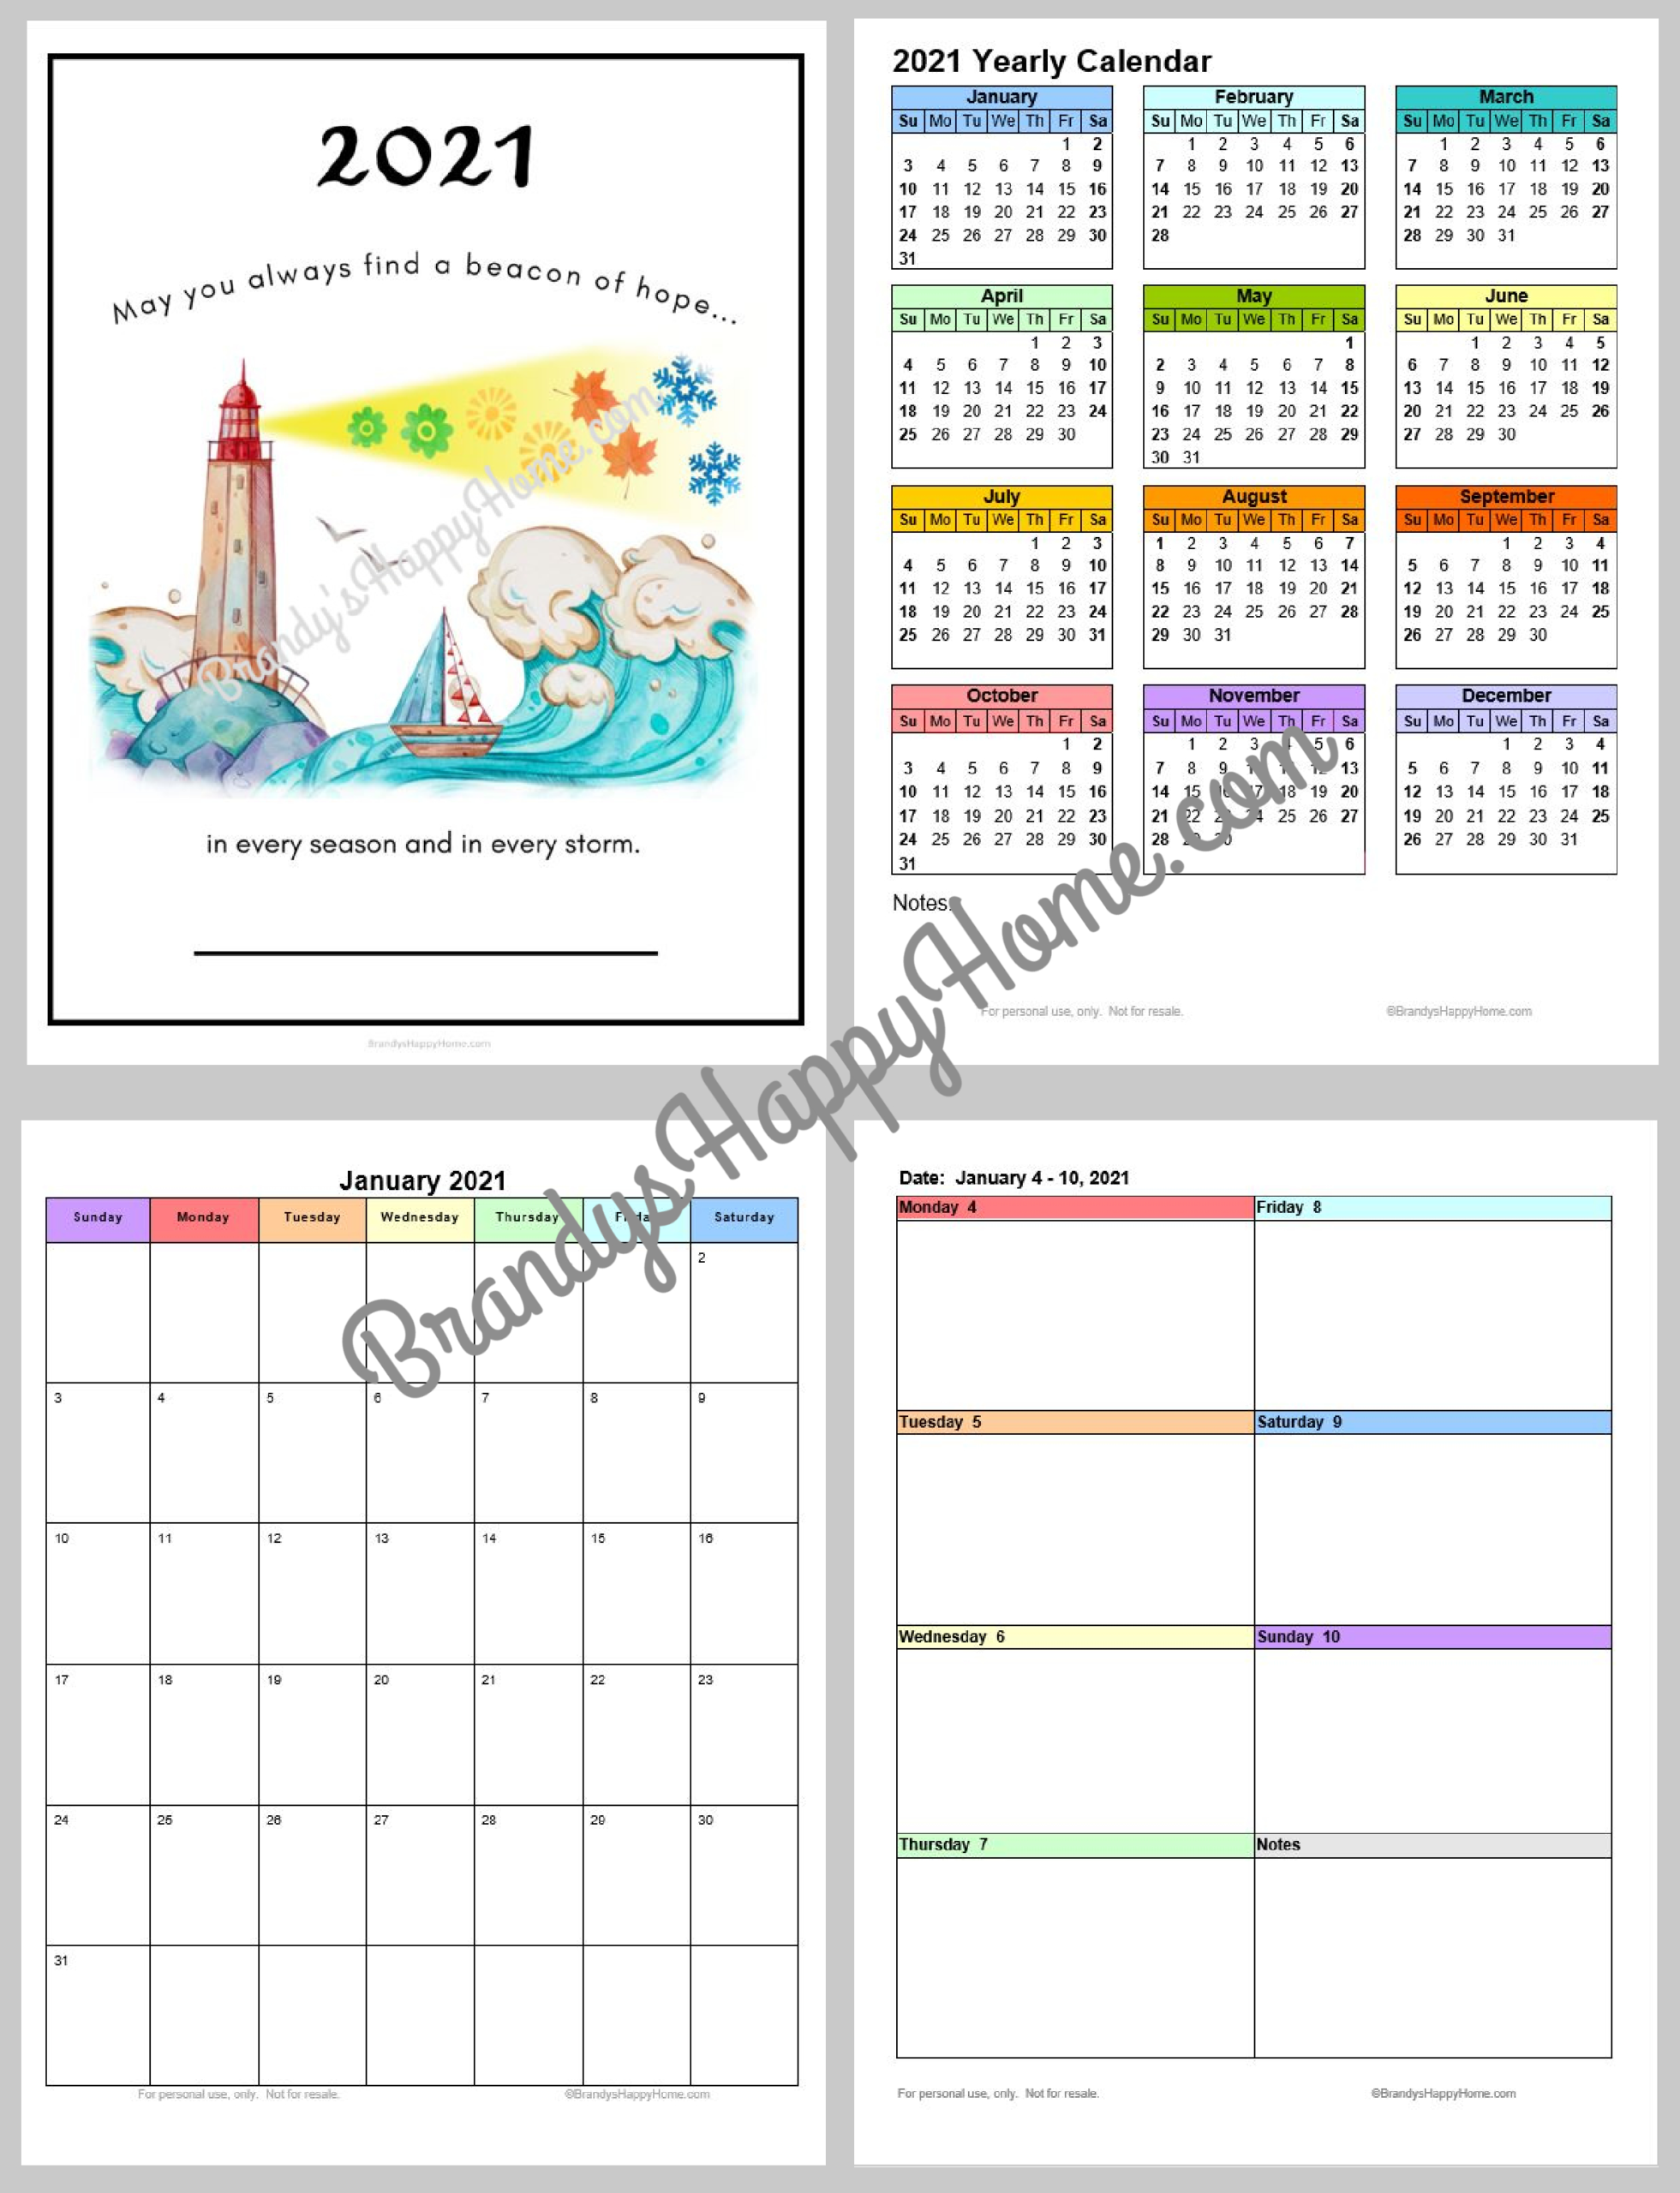 Free 2021 Calendar Planner Printables intended for 2021 Printable Pocket Calendars